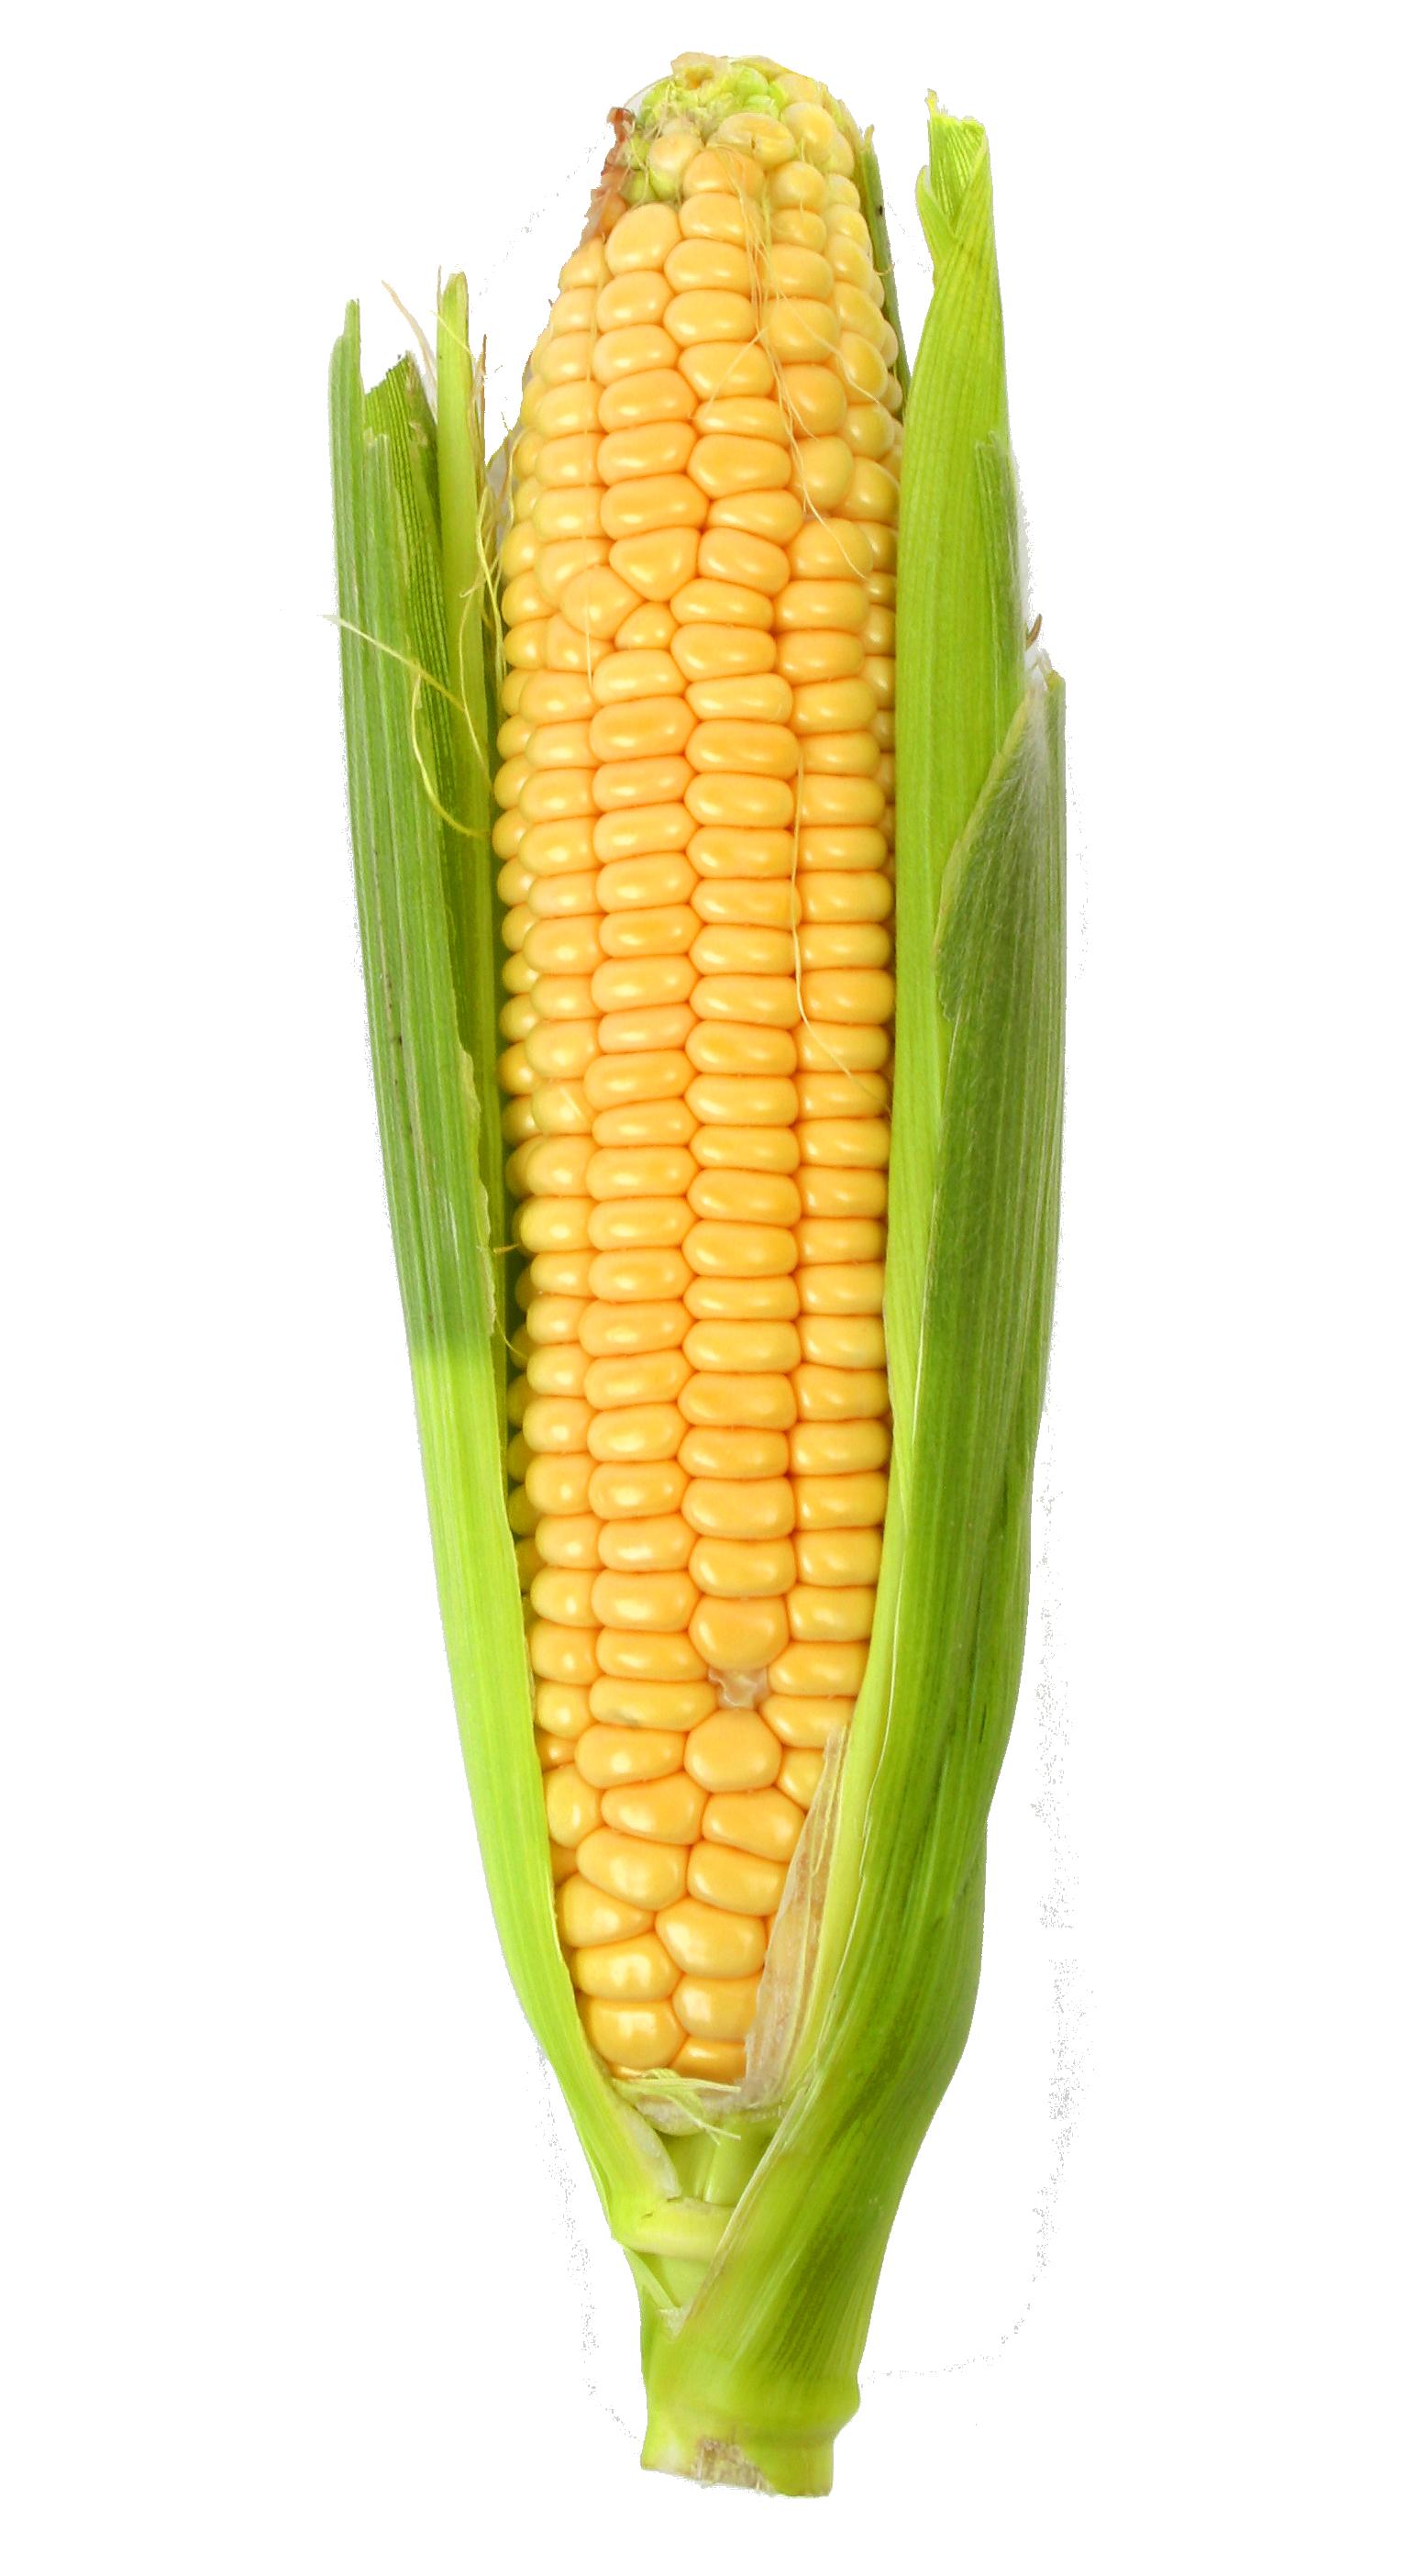 Grain clipart corn grain. Png image purepng free